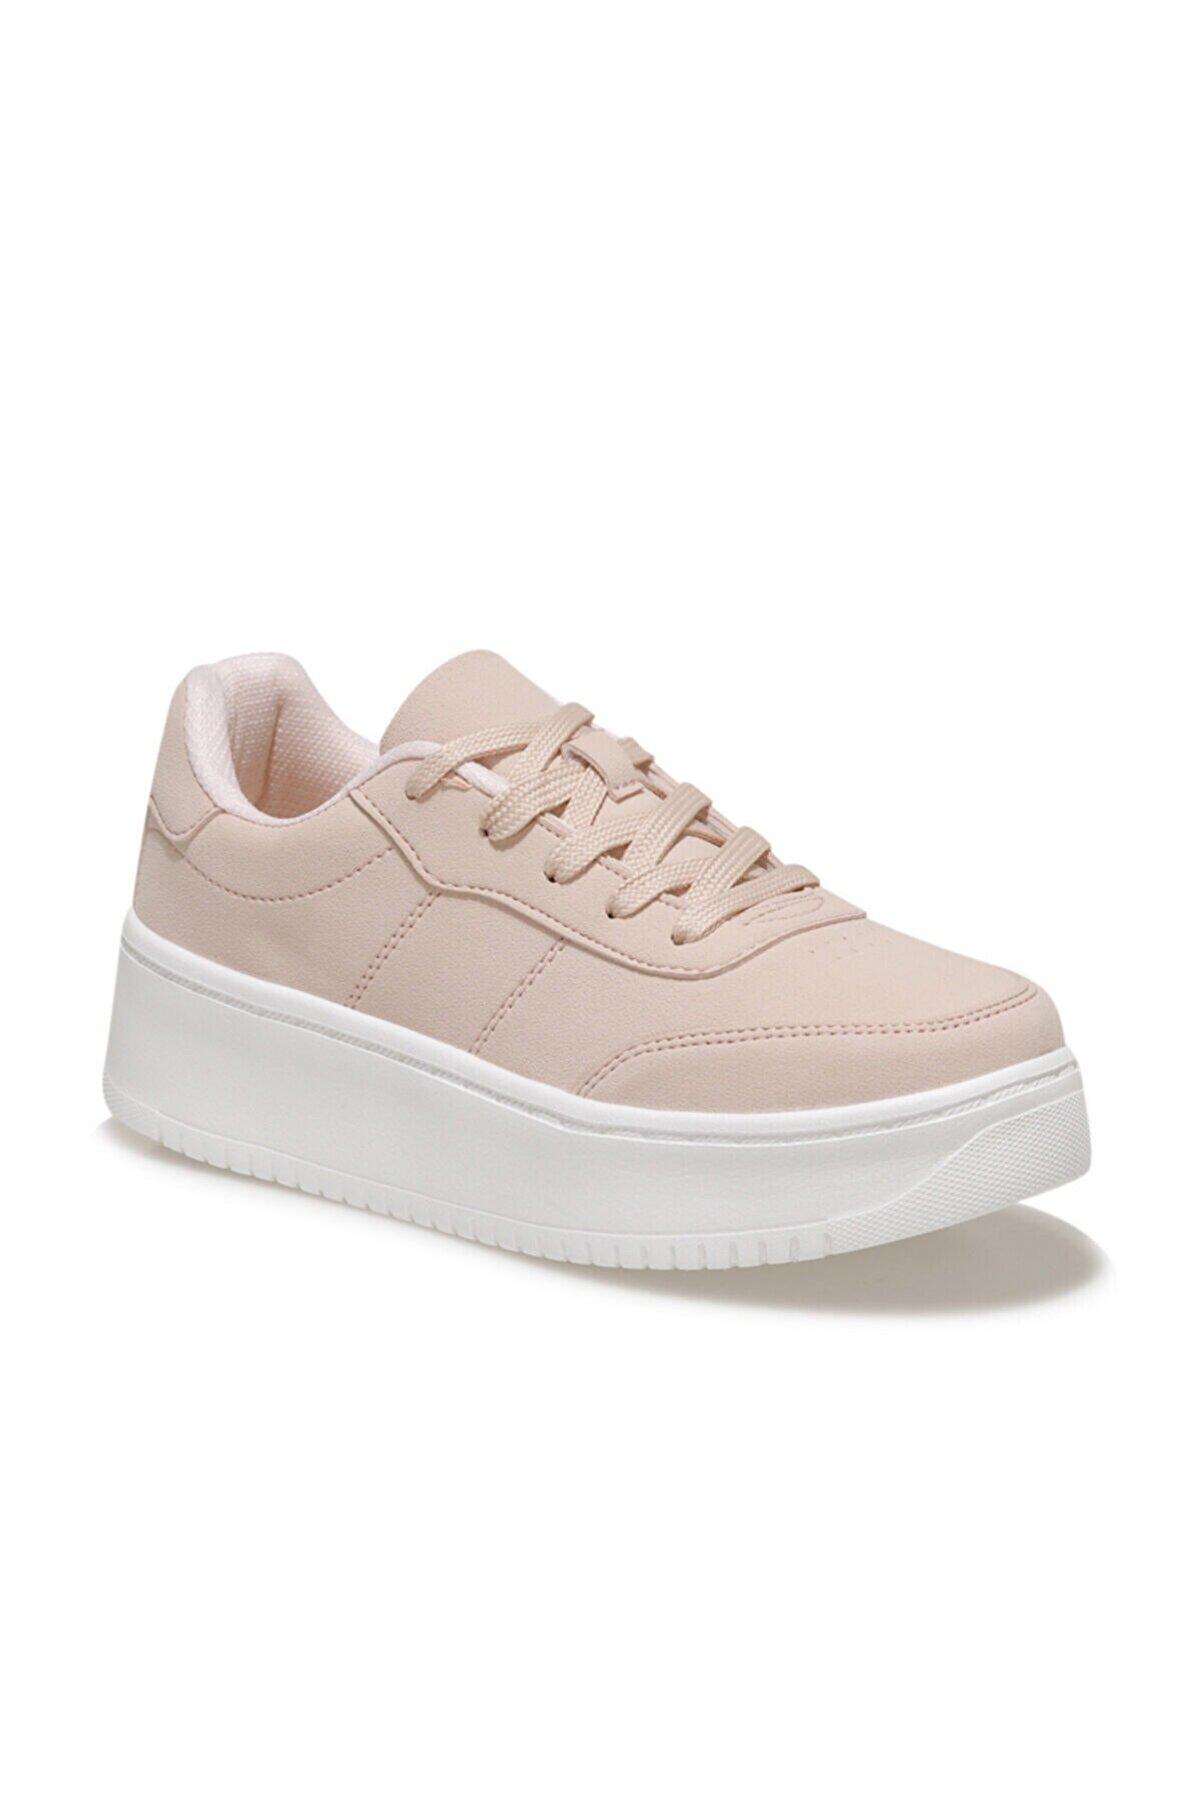 Kinetix LIZA 1FX Pembe Kadın Havuz Taban Sneaker 100586943